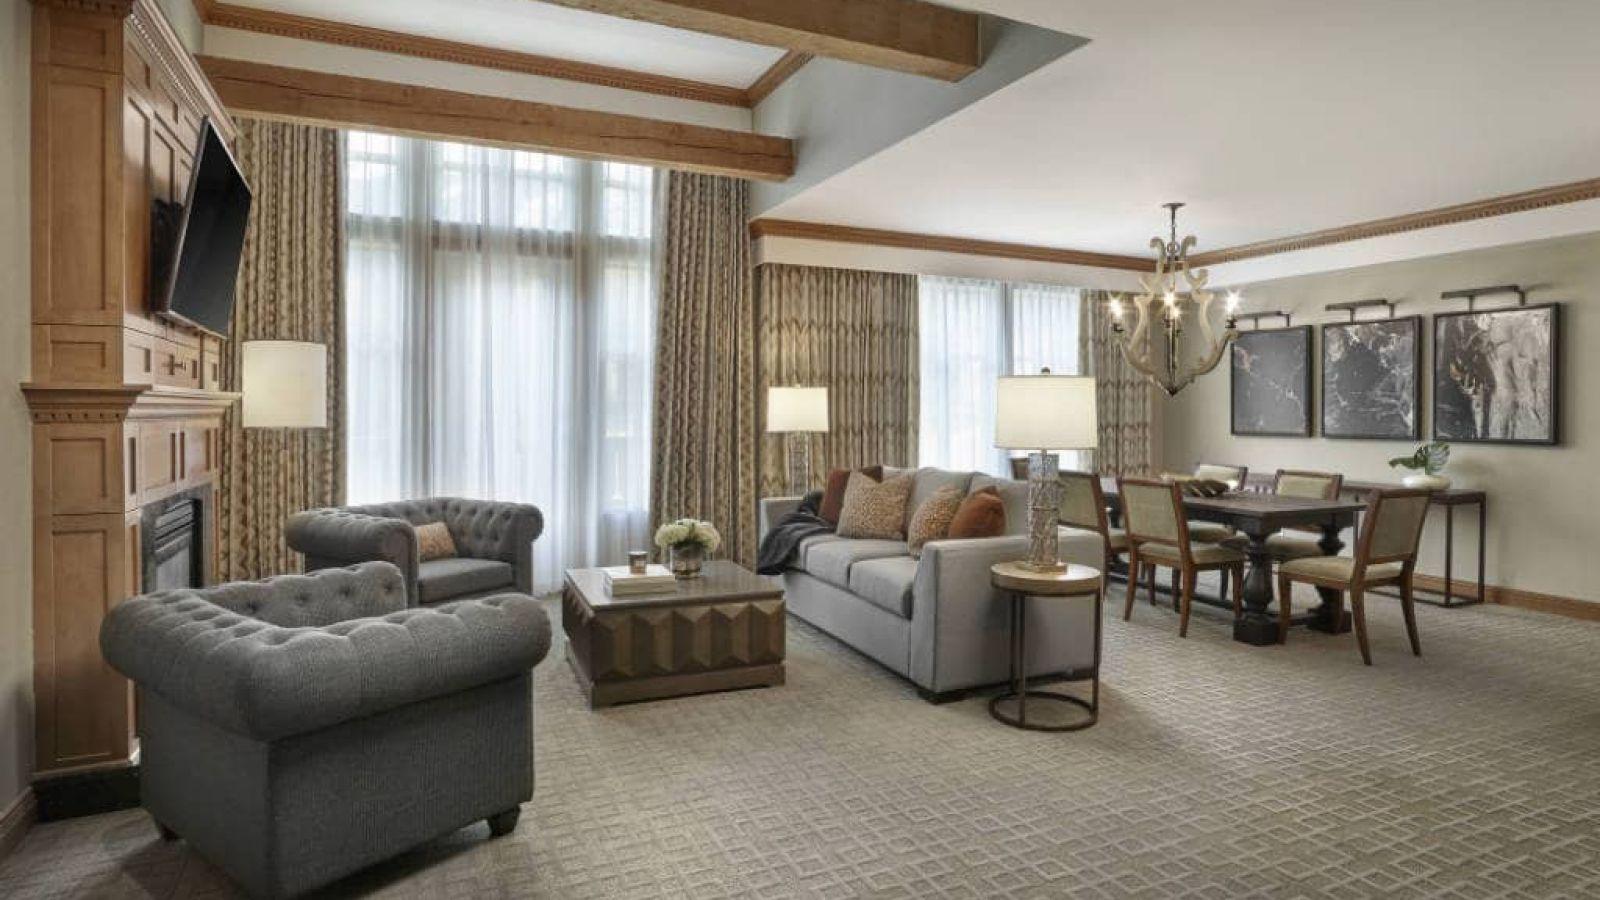 Sun Peaks Grand - Suites (1 and 2 bedroom)